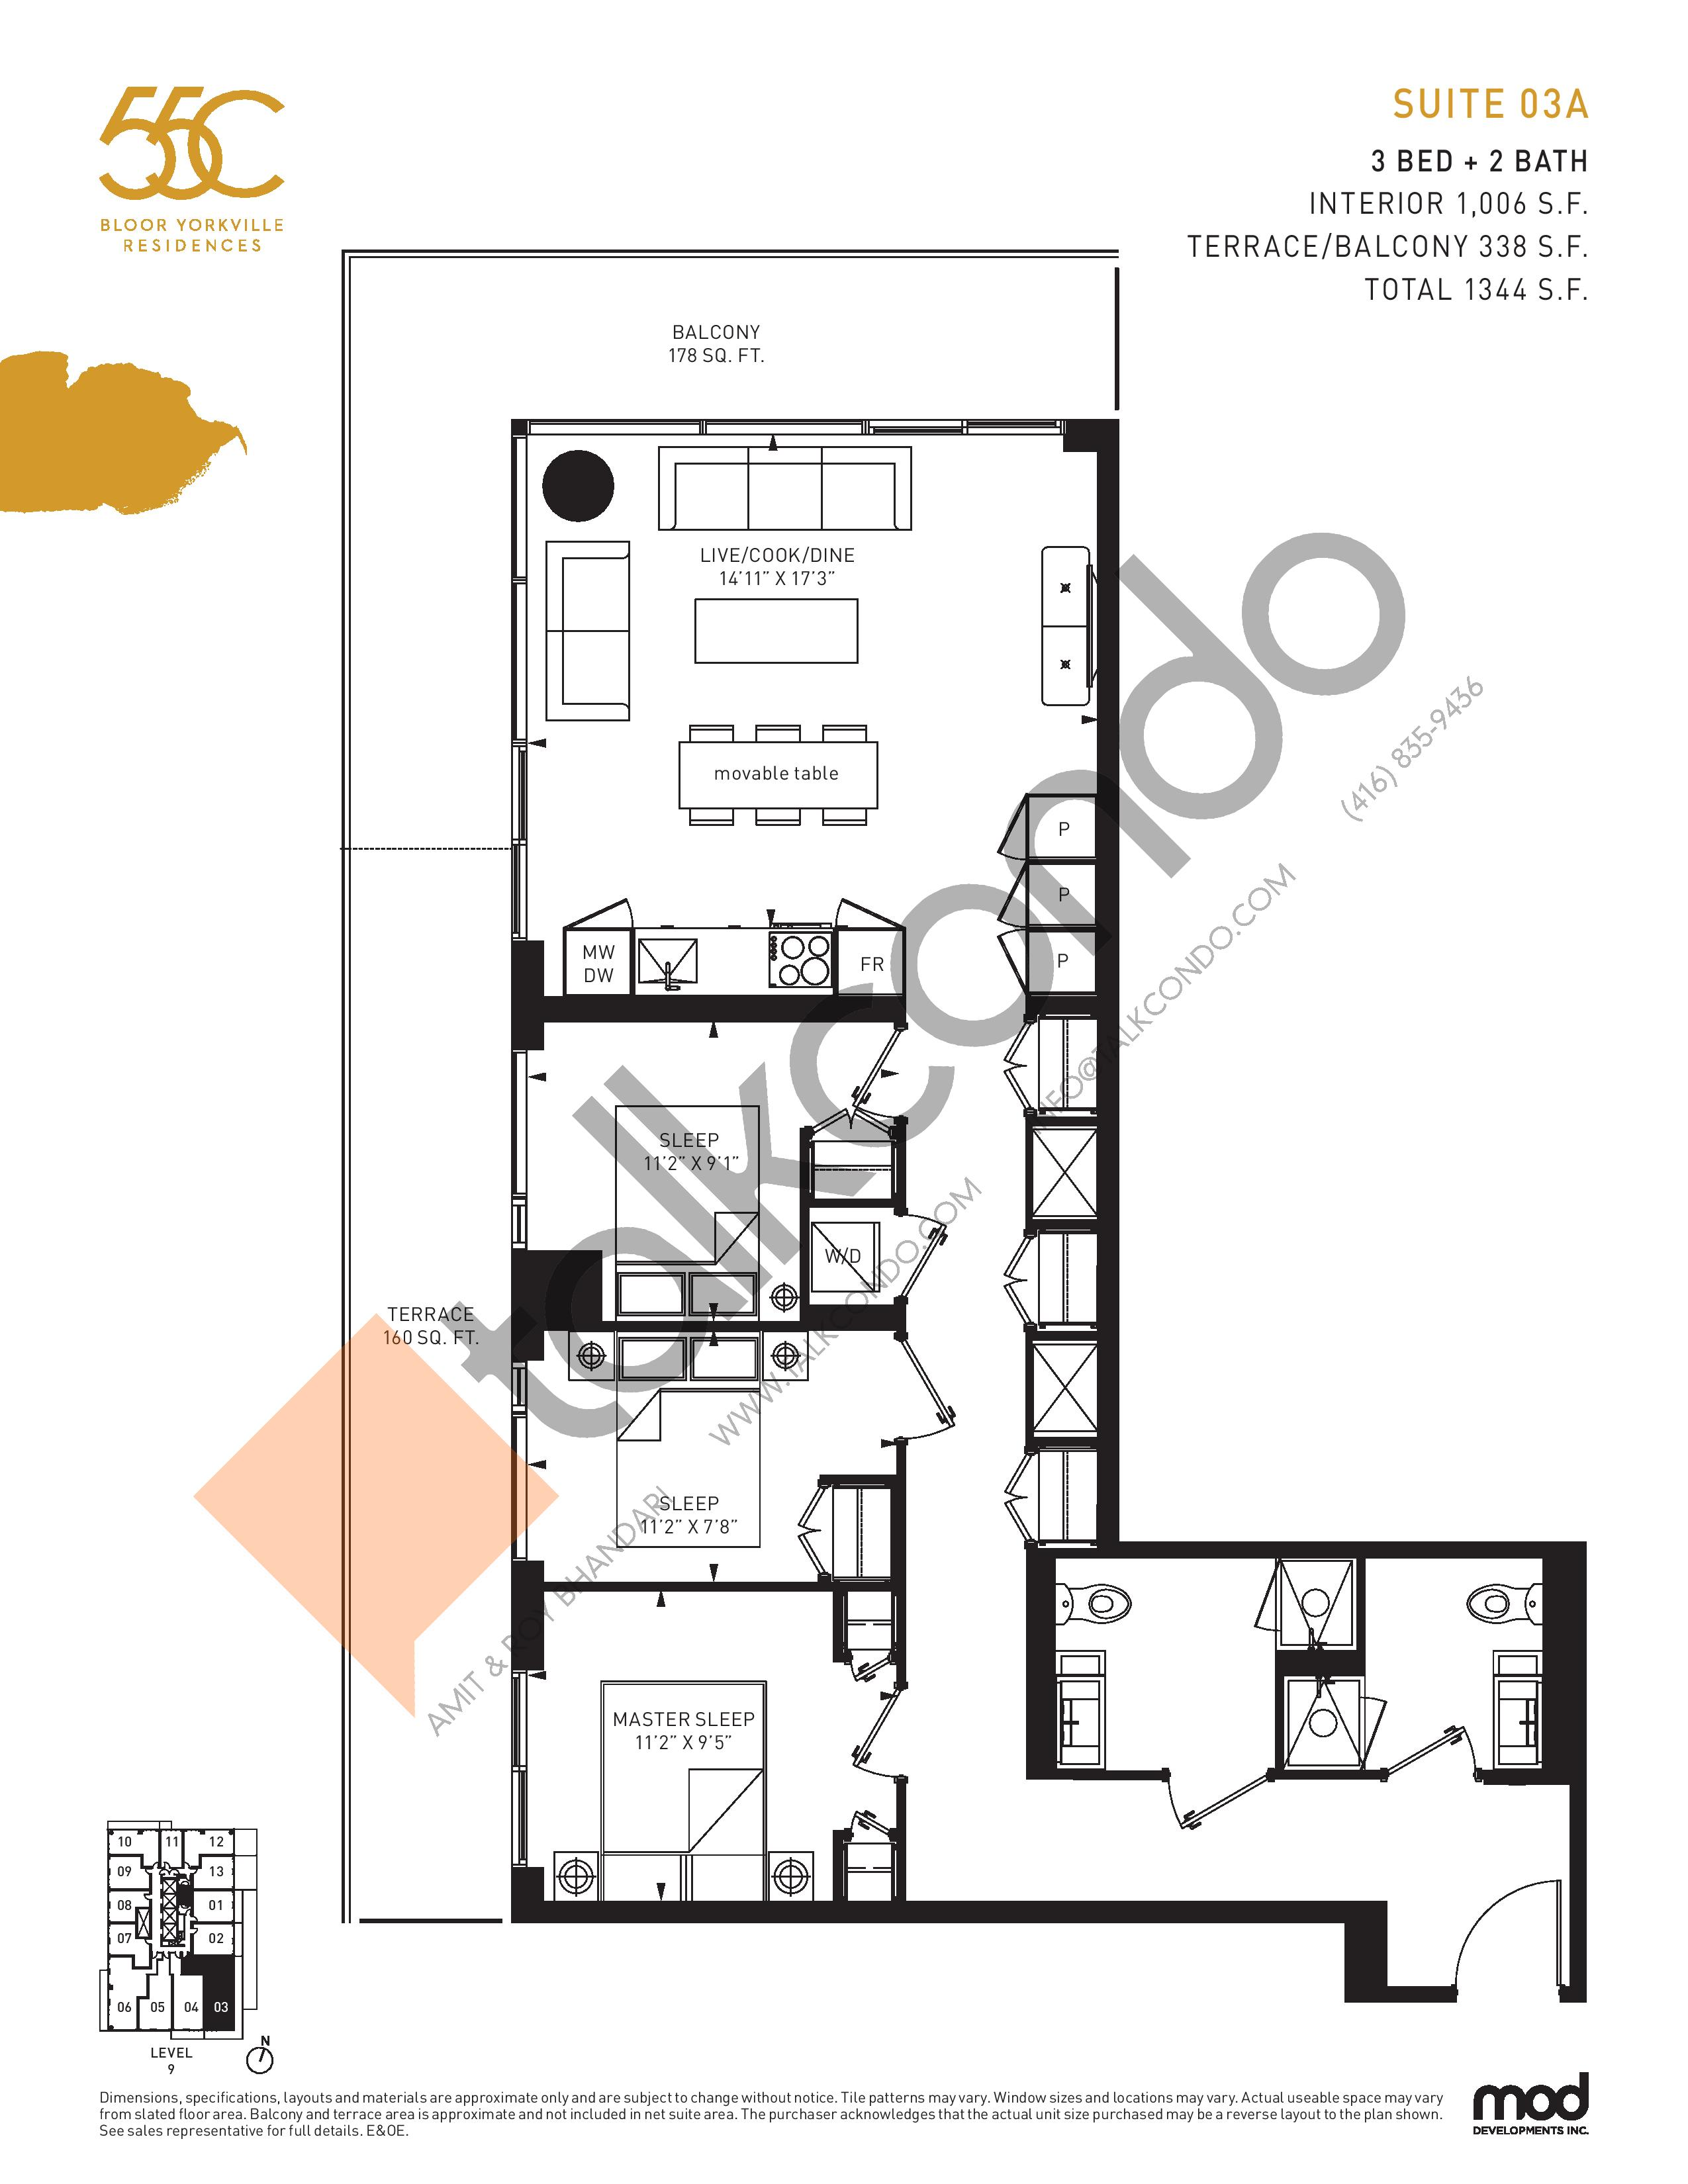 Suite 03A Floor Plan at 55C Condos - 1006 sq.ft